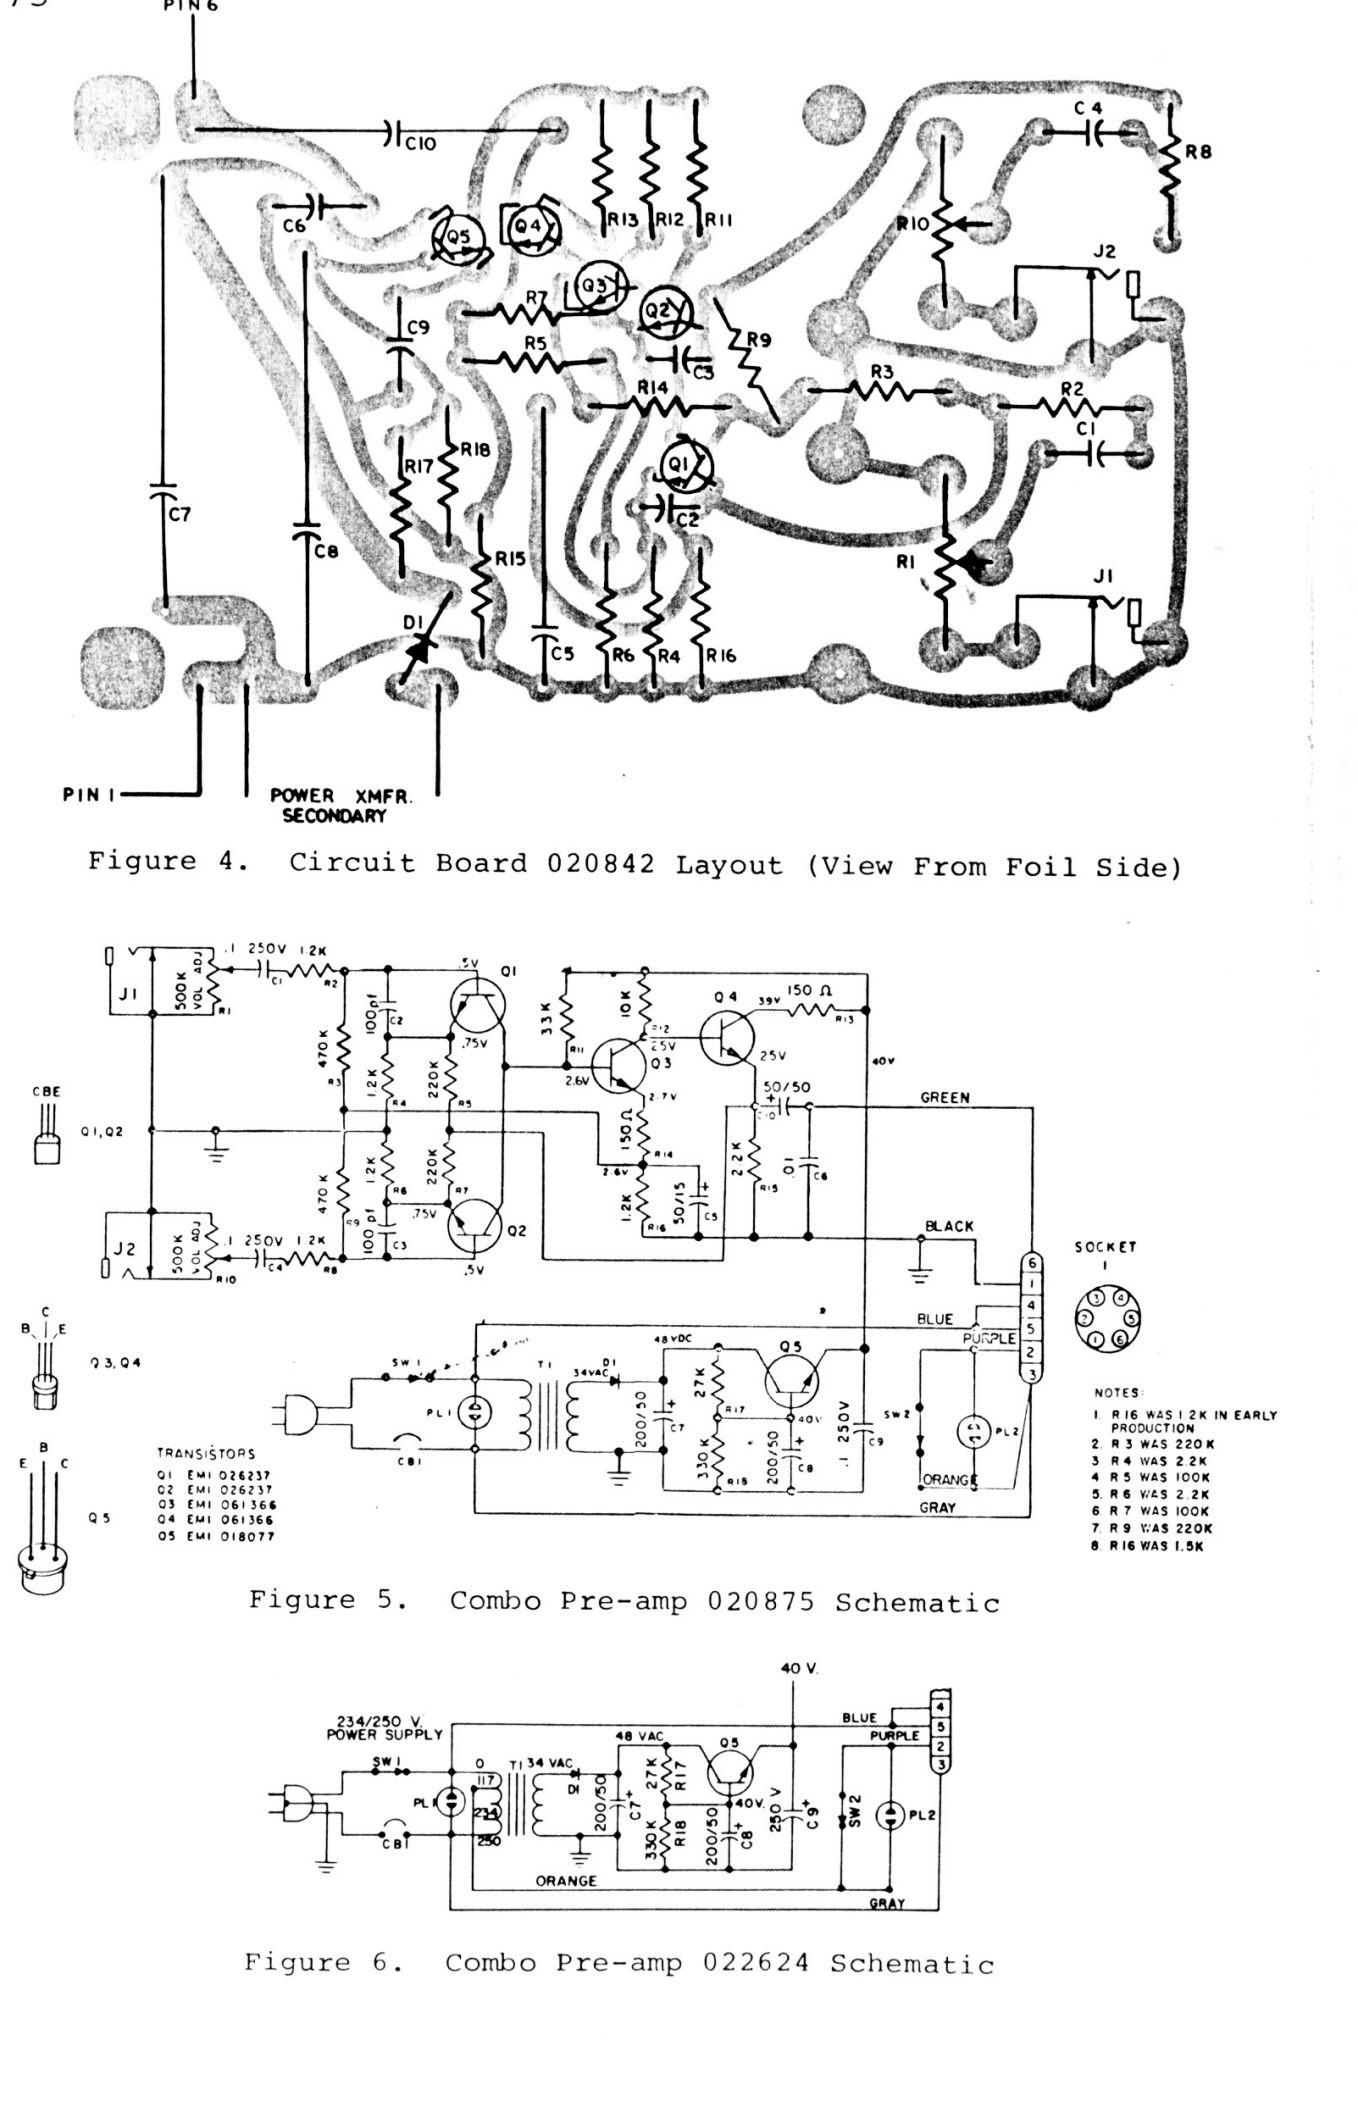 Car Air Horn Wiring Diagram as well 170w Audio Power  lifier further Circuits Circuit Symbols furthermore Schaltzeichen further Leslie  bo Pre  Schematic. on wiring schematics